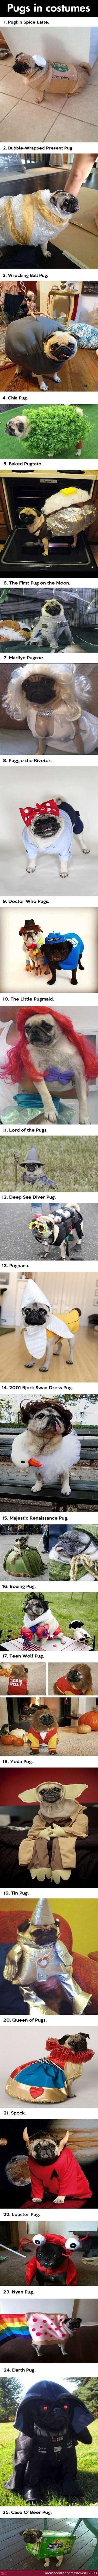 Pugs In Costumes.  So cute!!